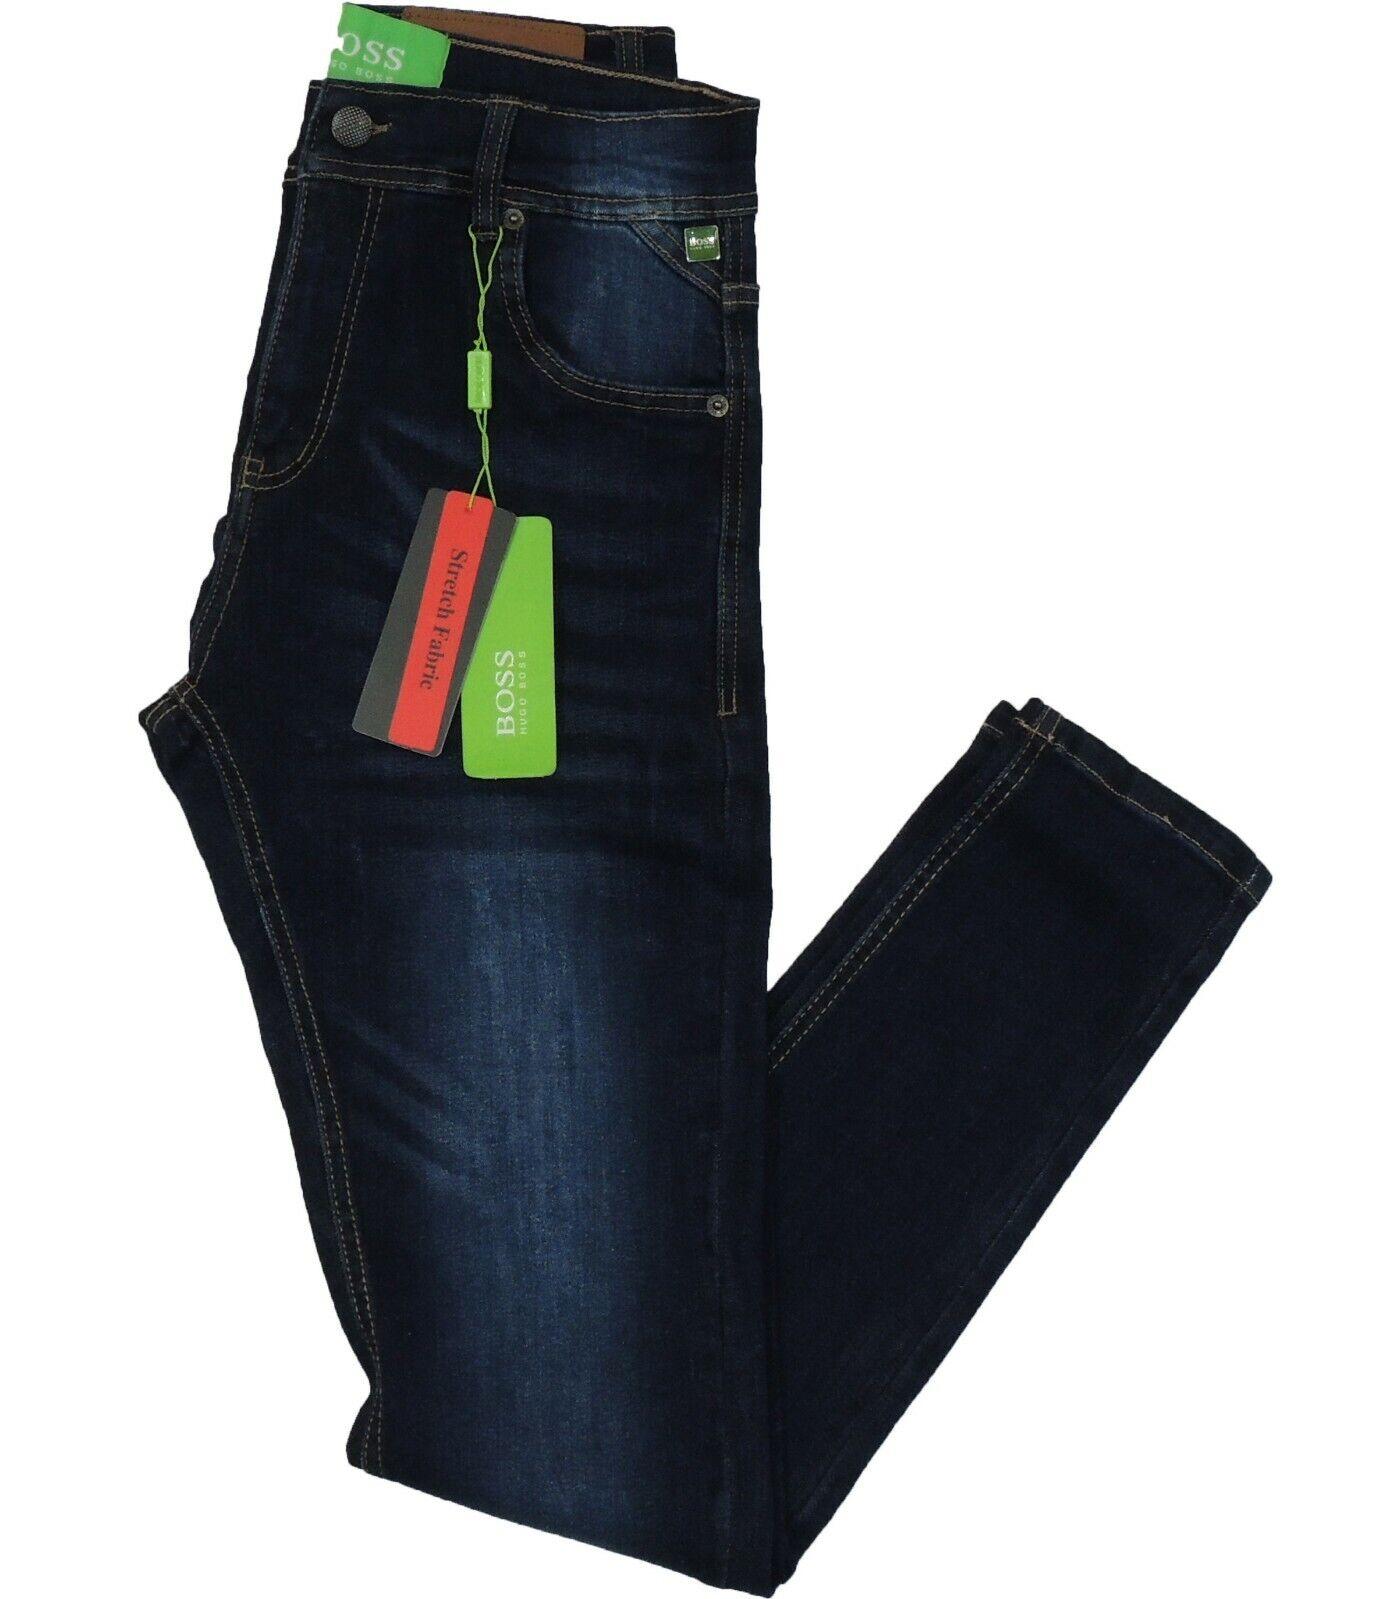 Hugo Boss Green Label Montana Jeans Super Slim Fit Stretch Dark bluee RRP